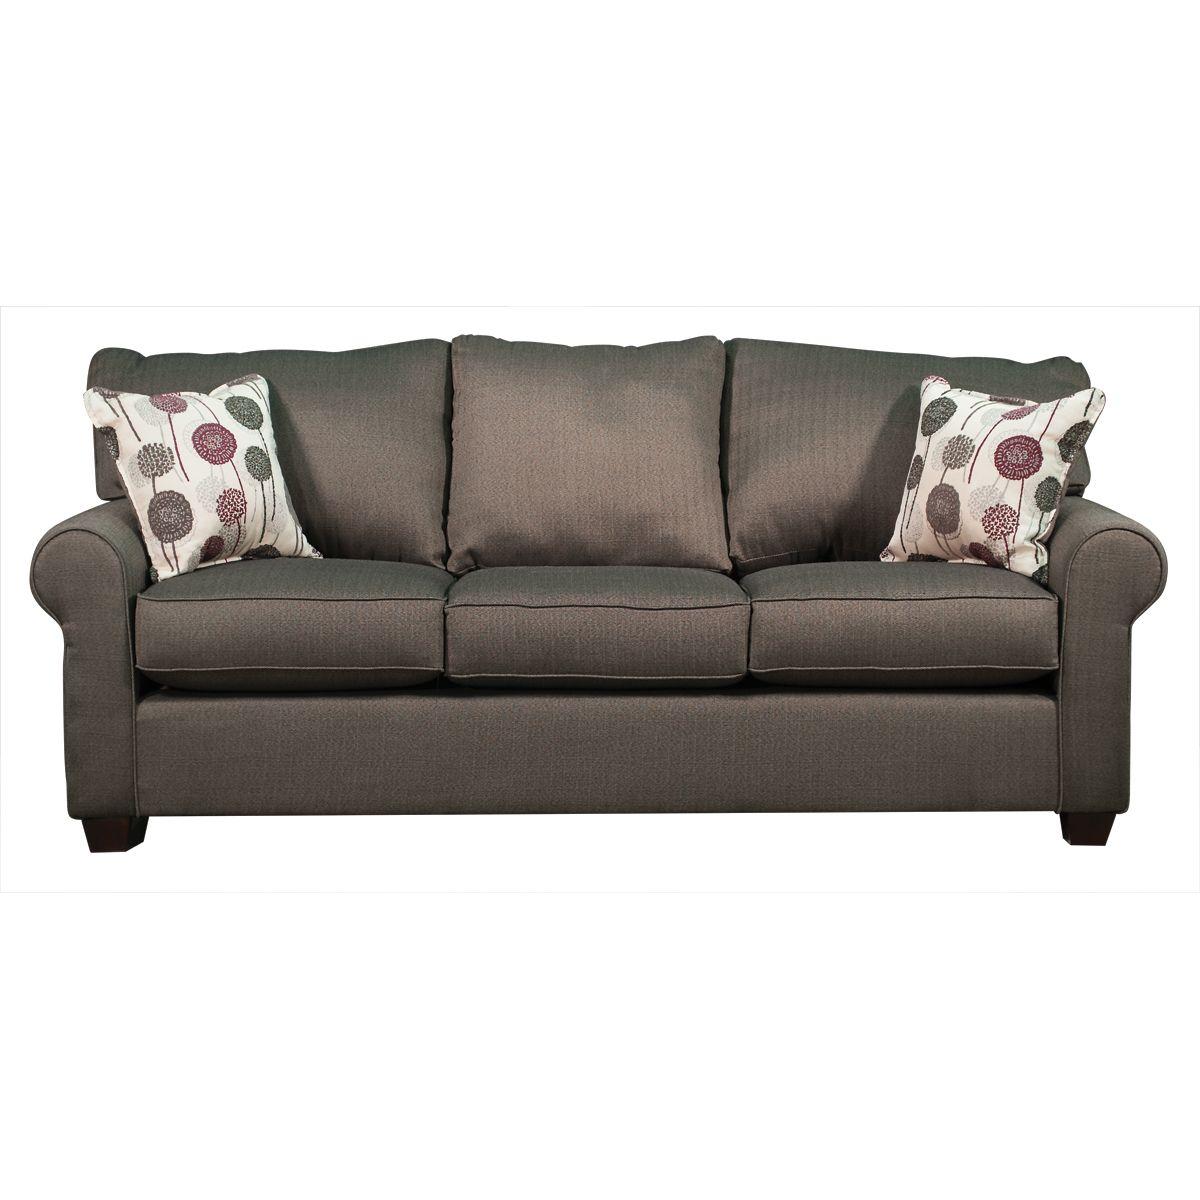 fabric couches casual contemporary slate sofa - seaside FQASCGK